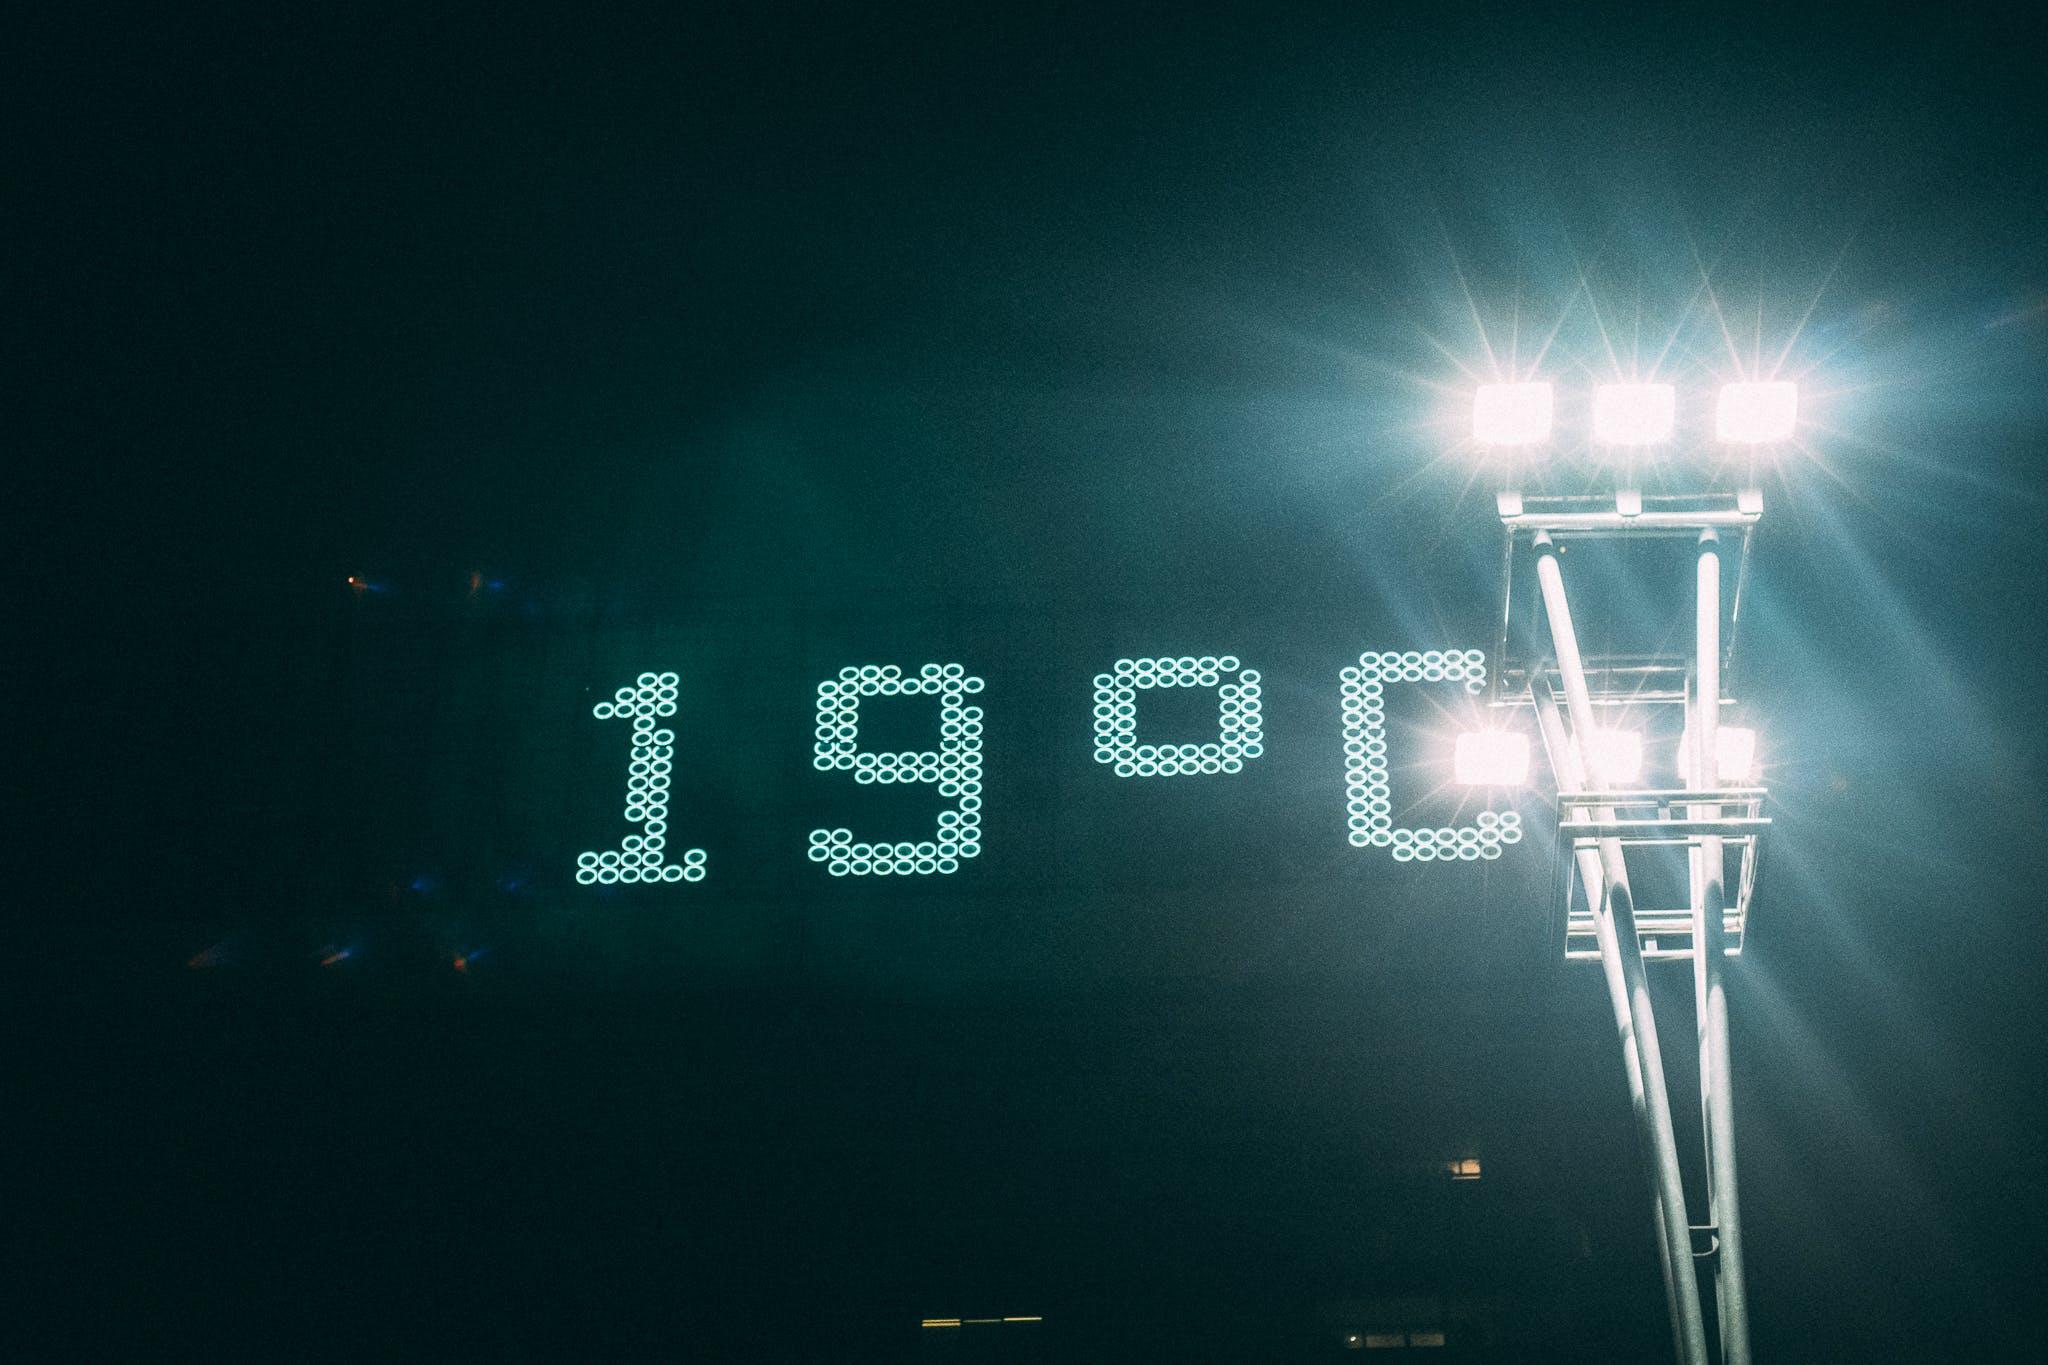 Free stock photo of lights, dark, technology, evening